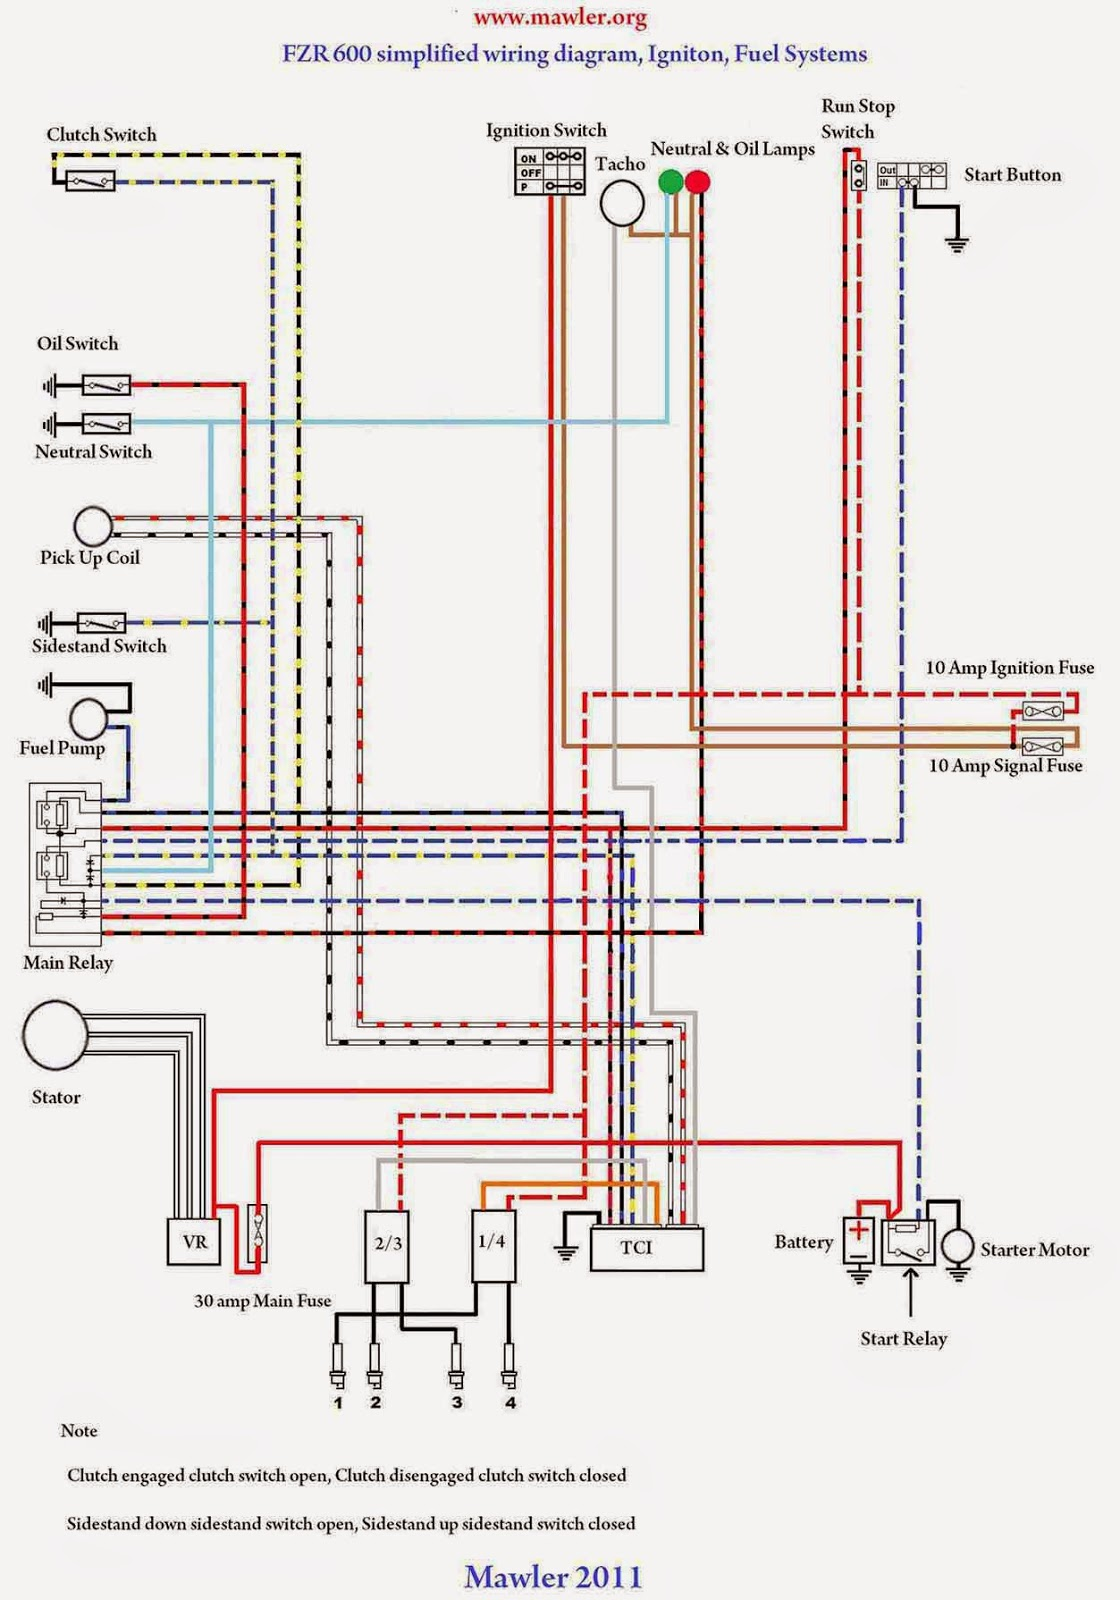 yamaha fzr600 wiring diagram images of furthermore yamaha 600 wiring sc fzr600 wiring diagram at cita [ 1120 x 1600 Pixel ]